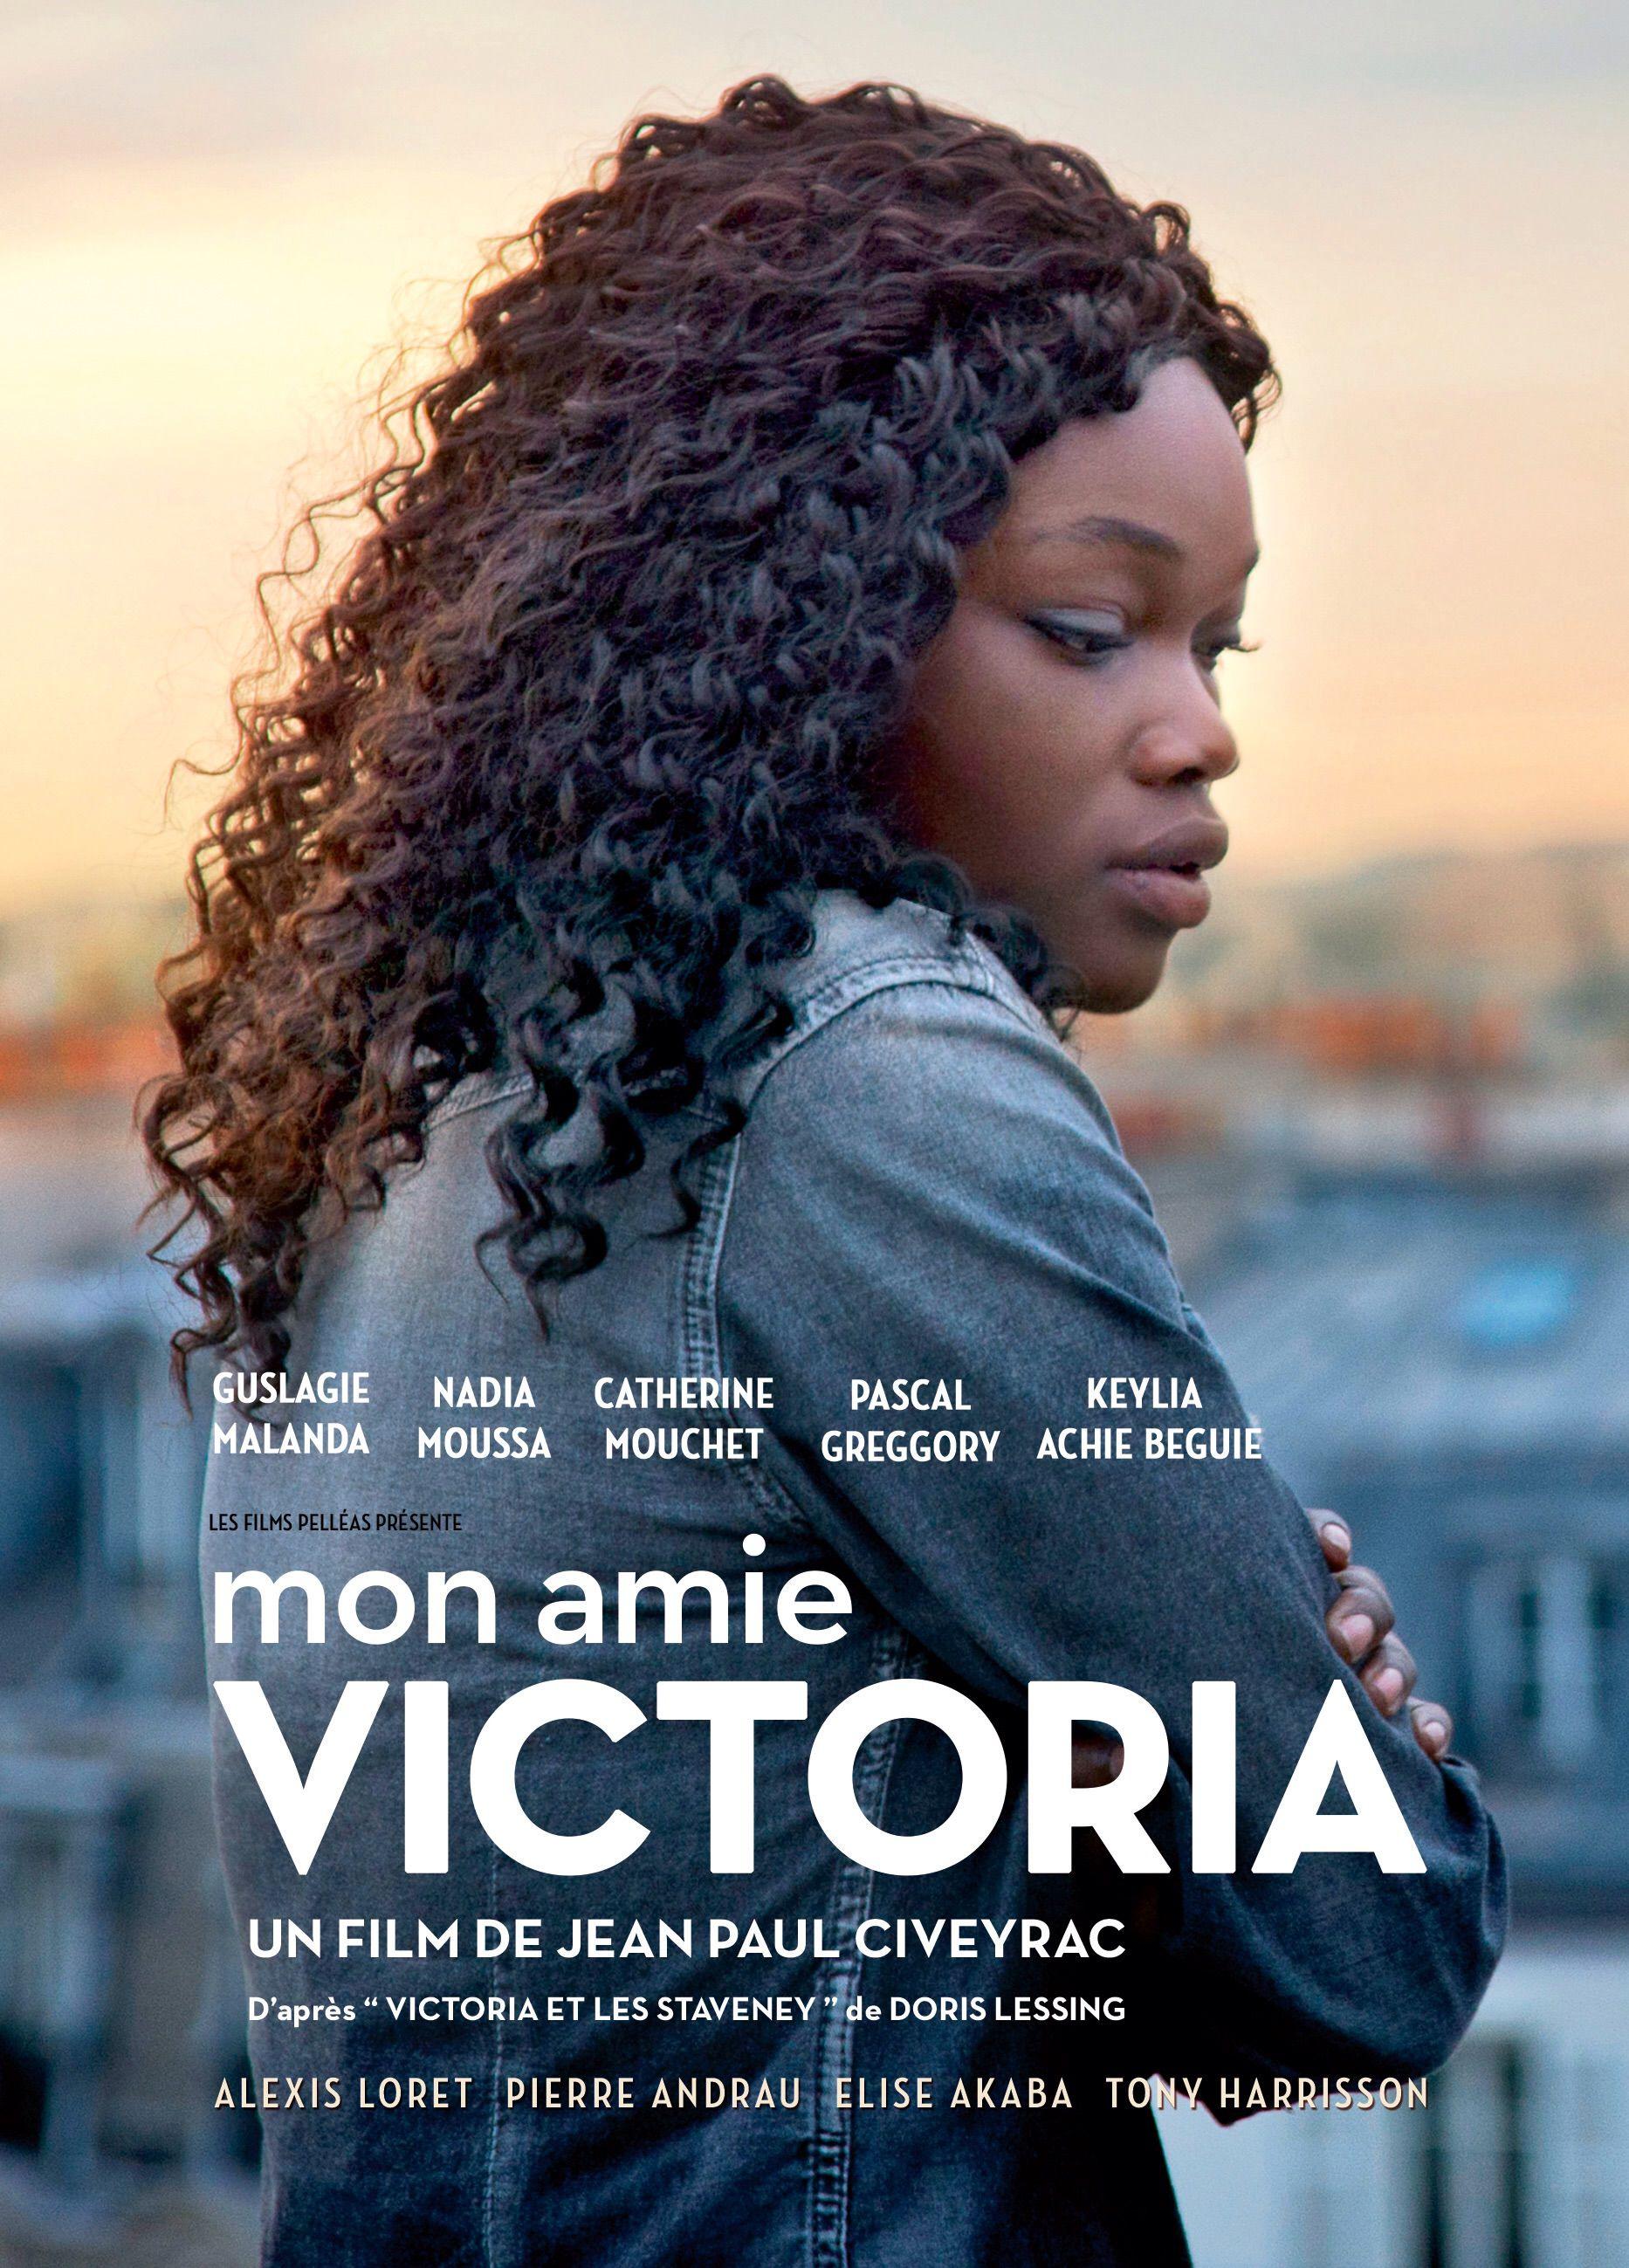 Mon amie Victoria - Film (2014)